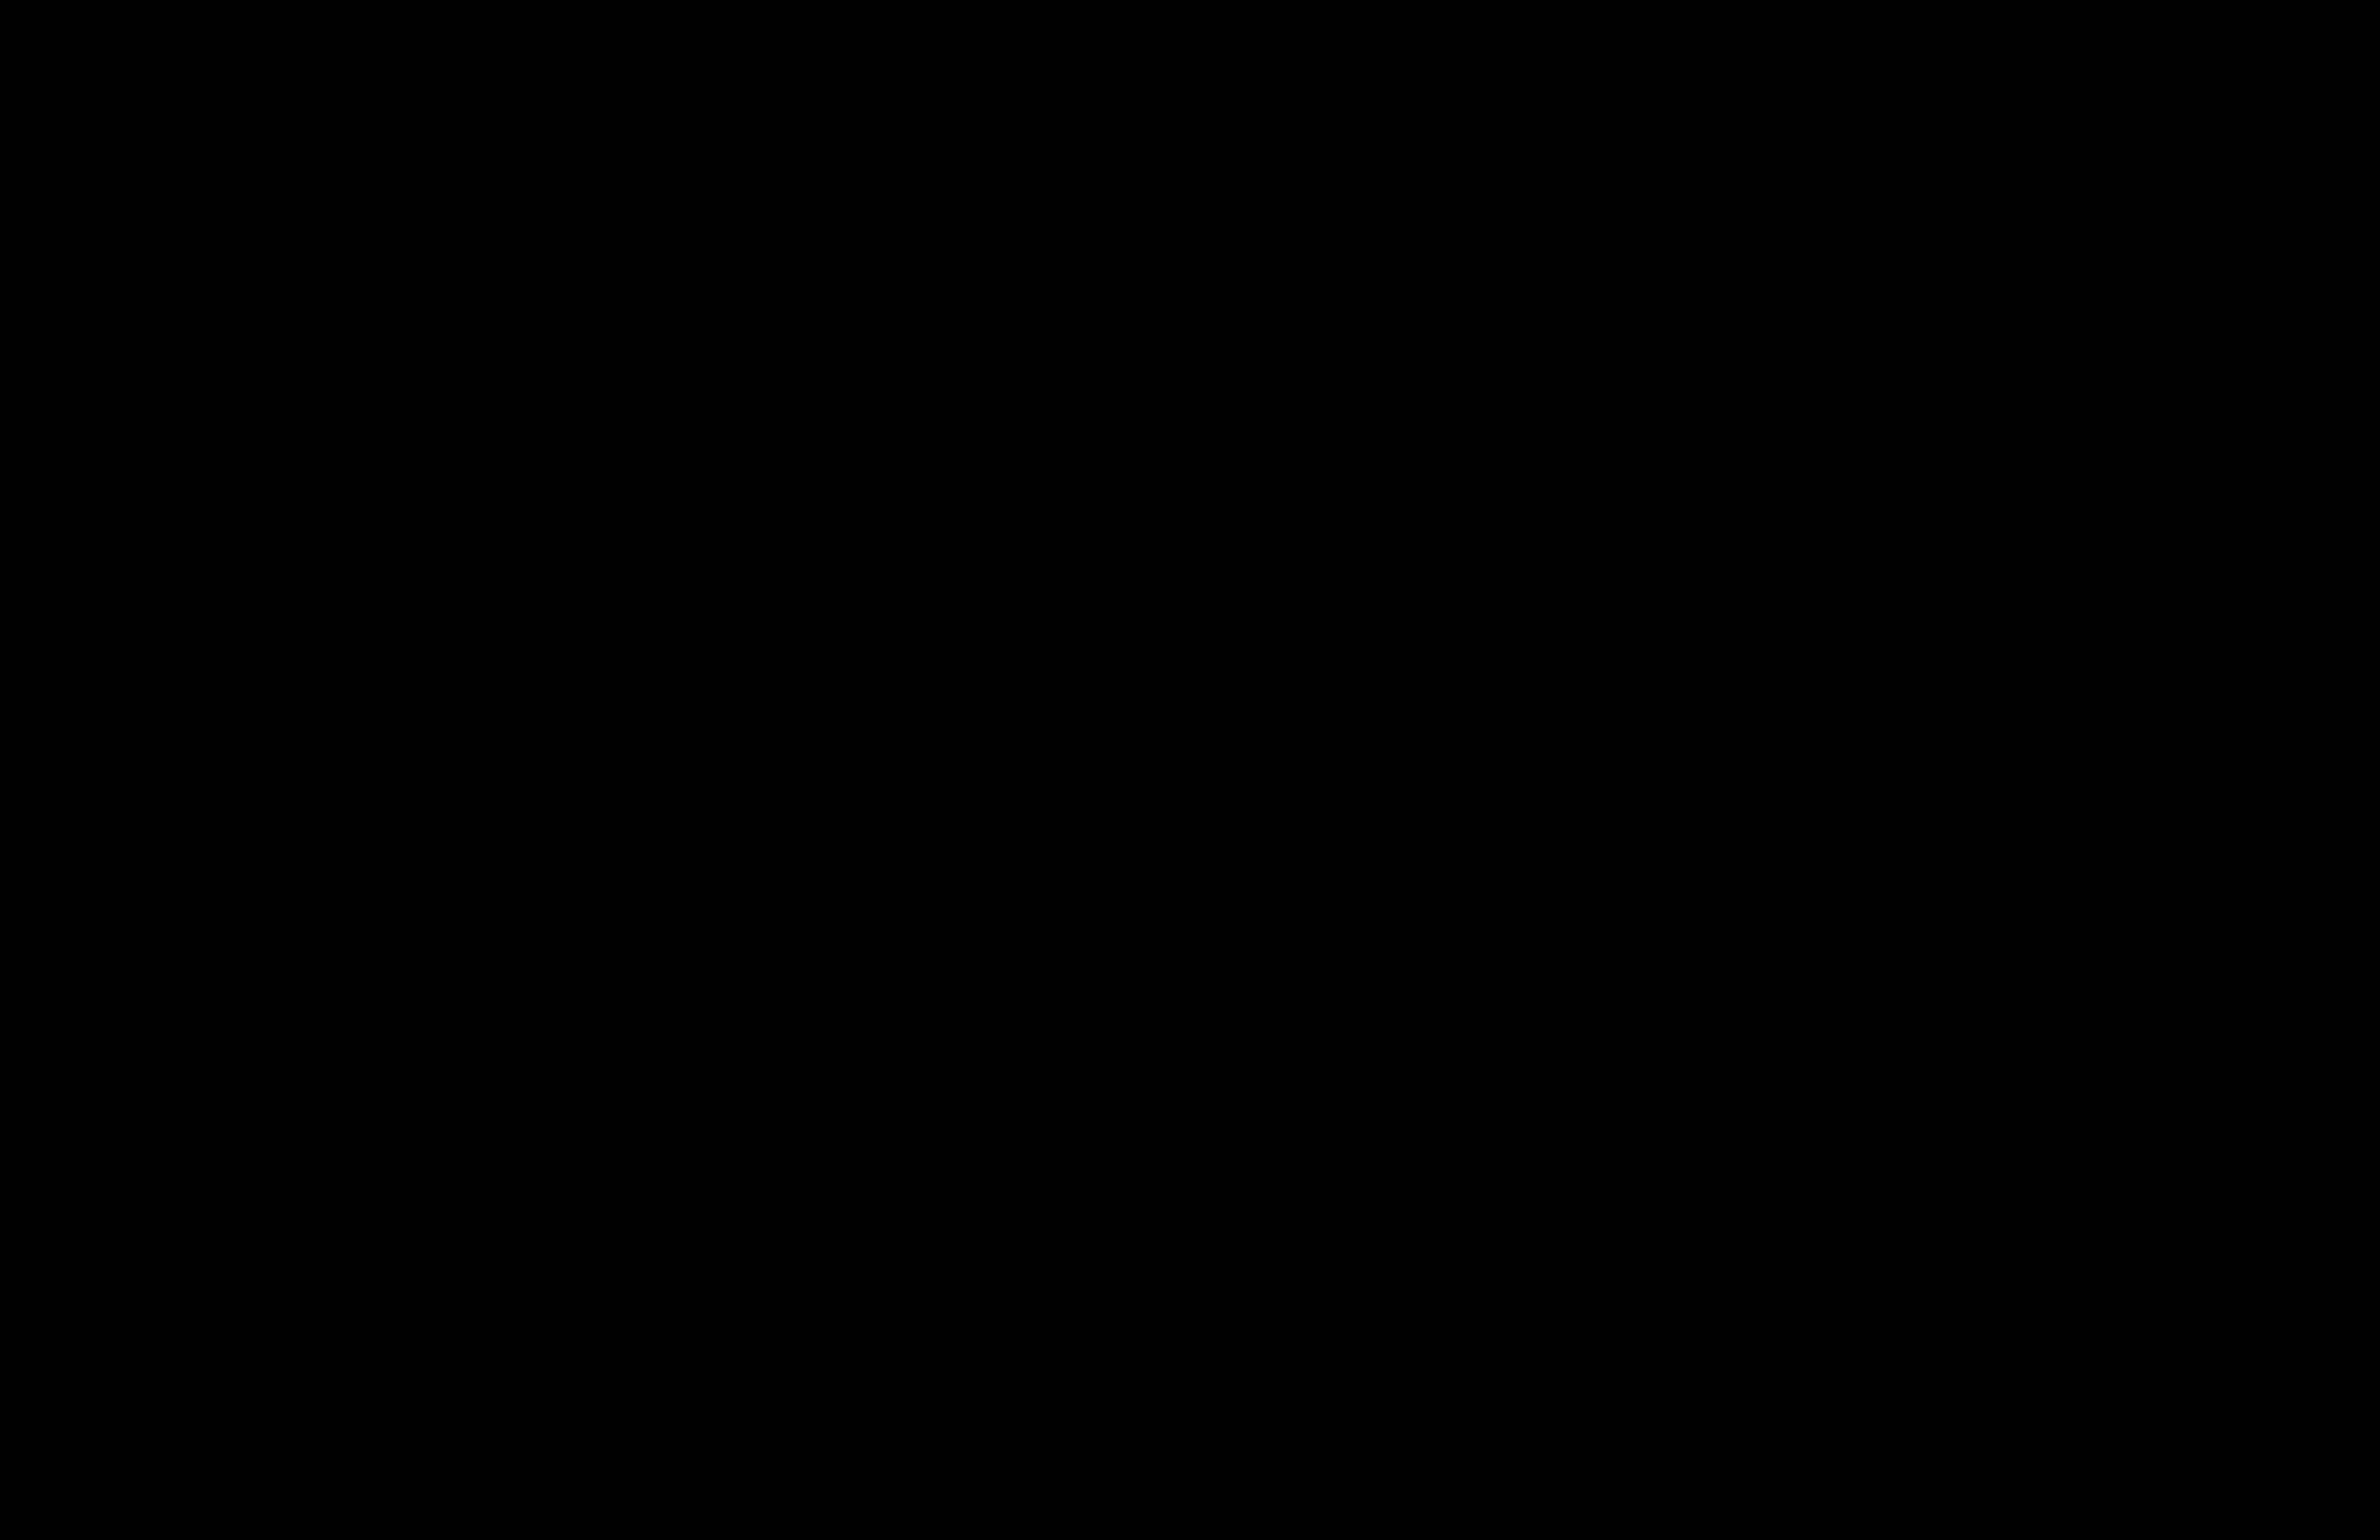 Tritonal logo